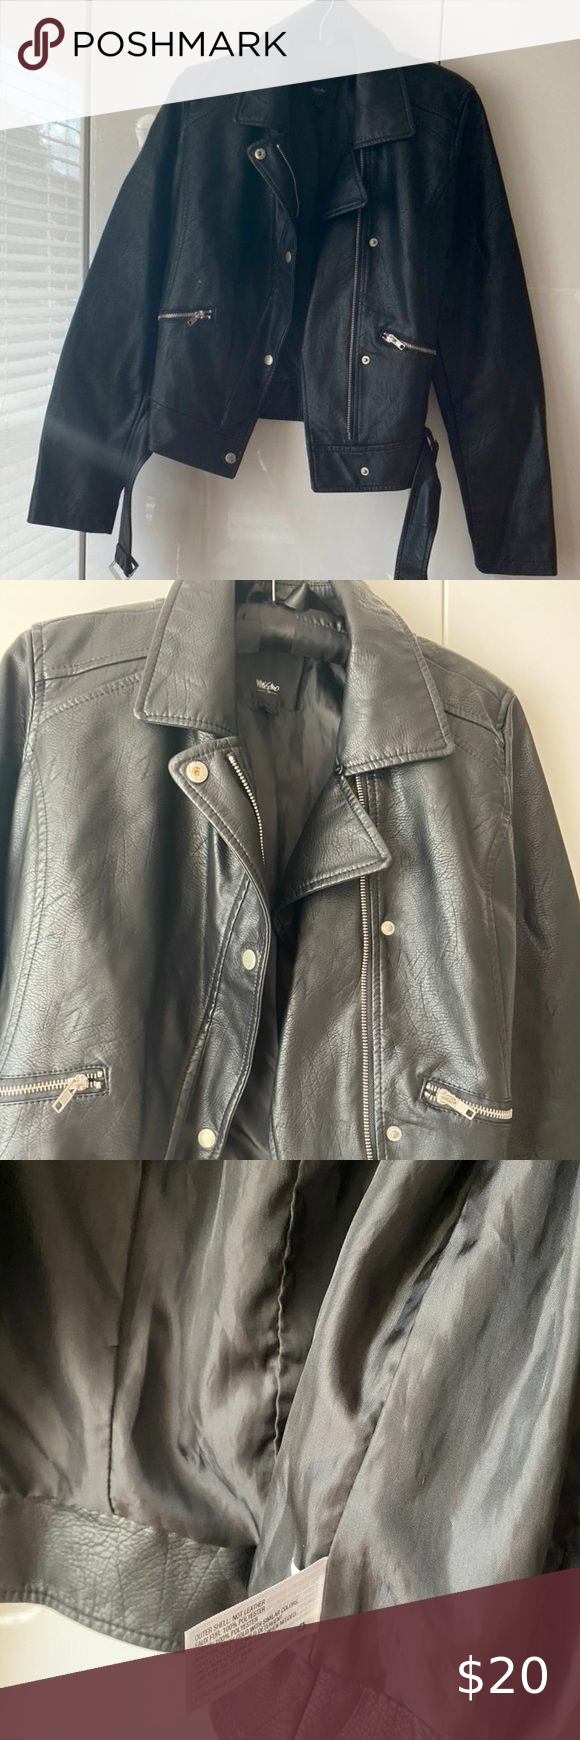 Nwot Black Faux Leather Moto Jacket M Black Faux Leather Moto Jacket Faux Leather Moto Jacket Leather Moto Jacket [ png ]